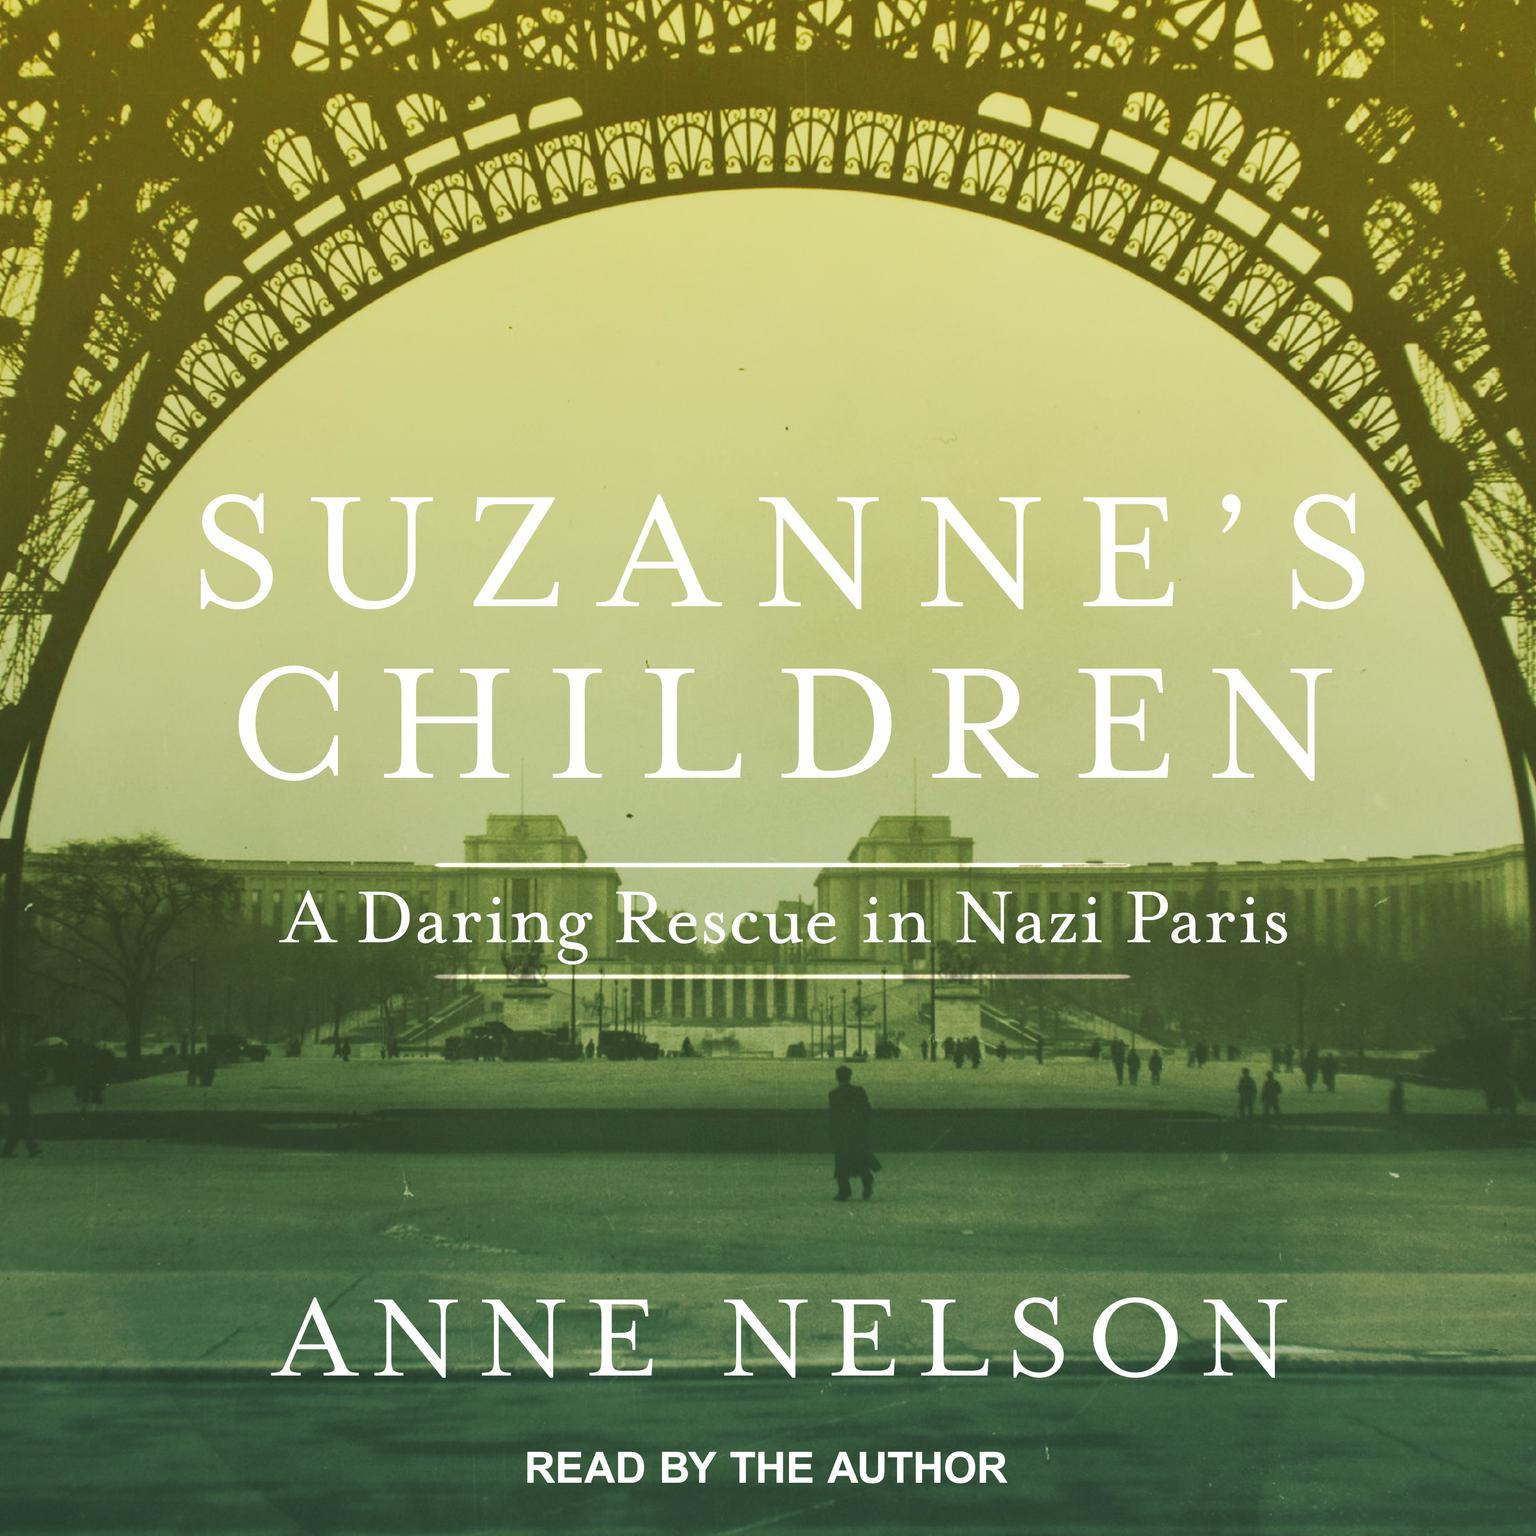 Suzannes Children: A Daring Rescue in Nazi Paris Audiobook, by Anne Nelson